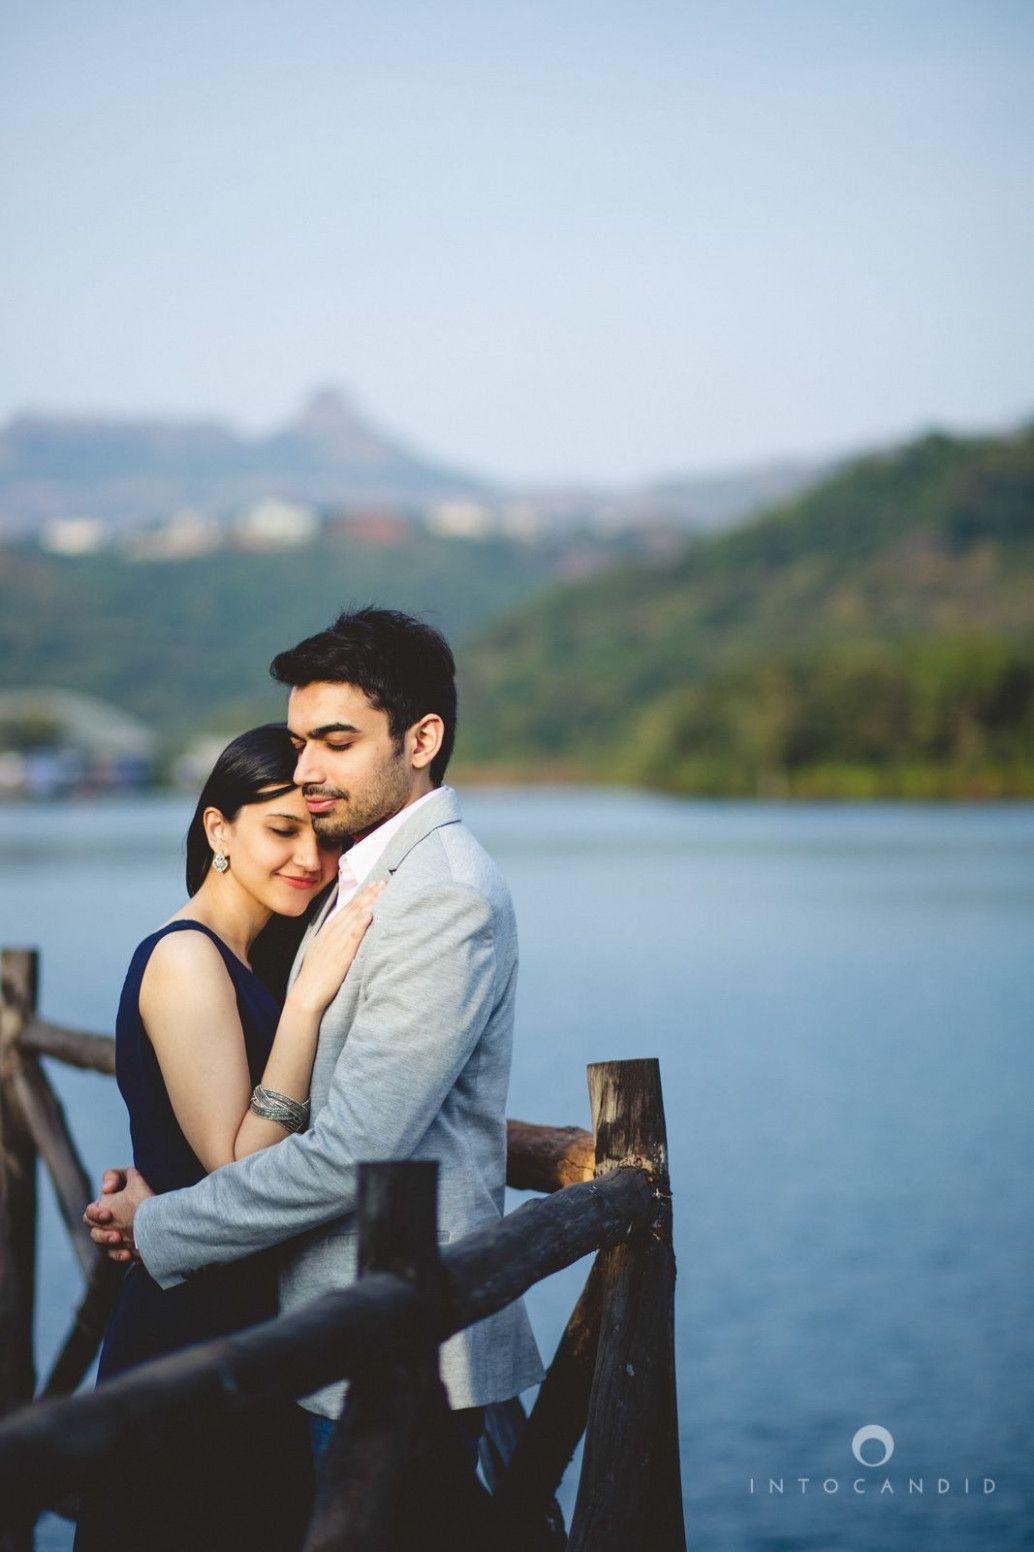 Wedding Photography City Photo Shoot | Pre wedding